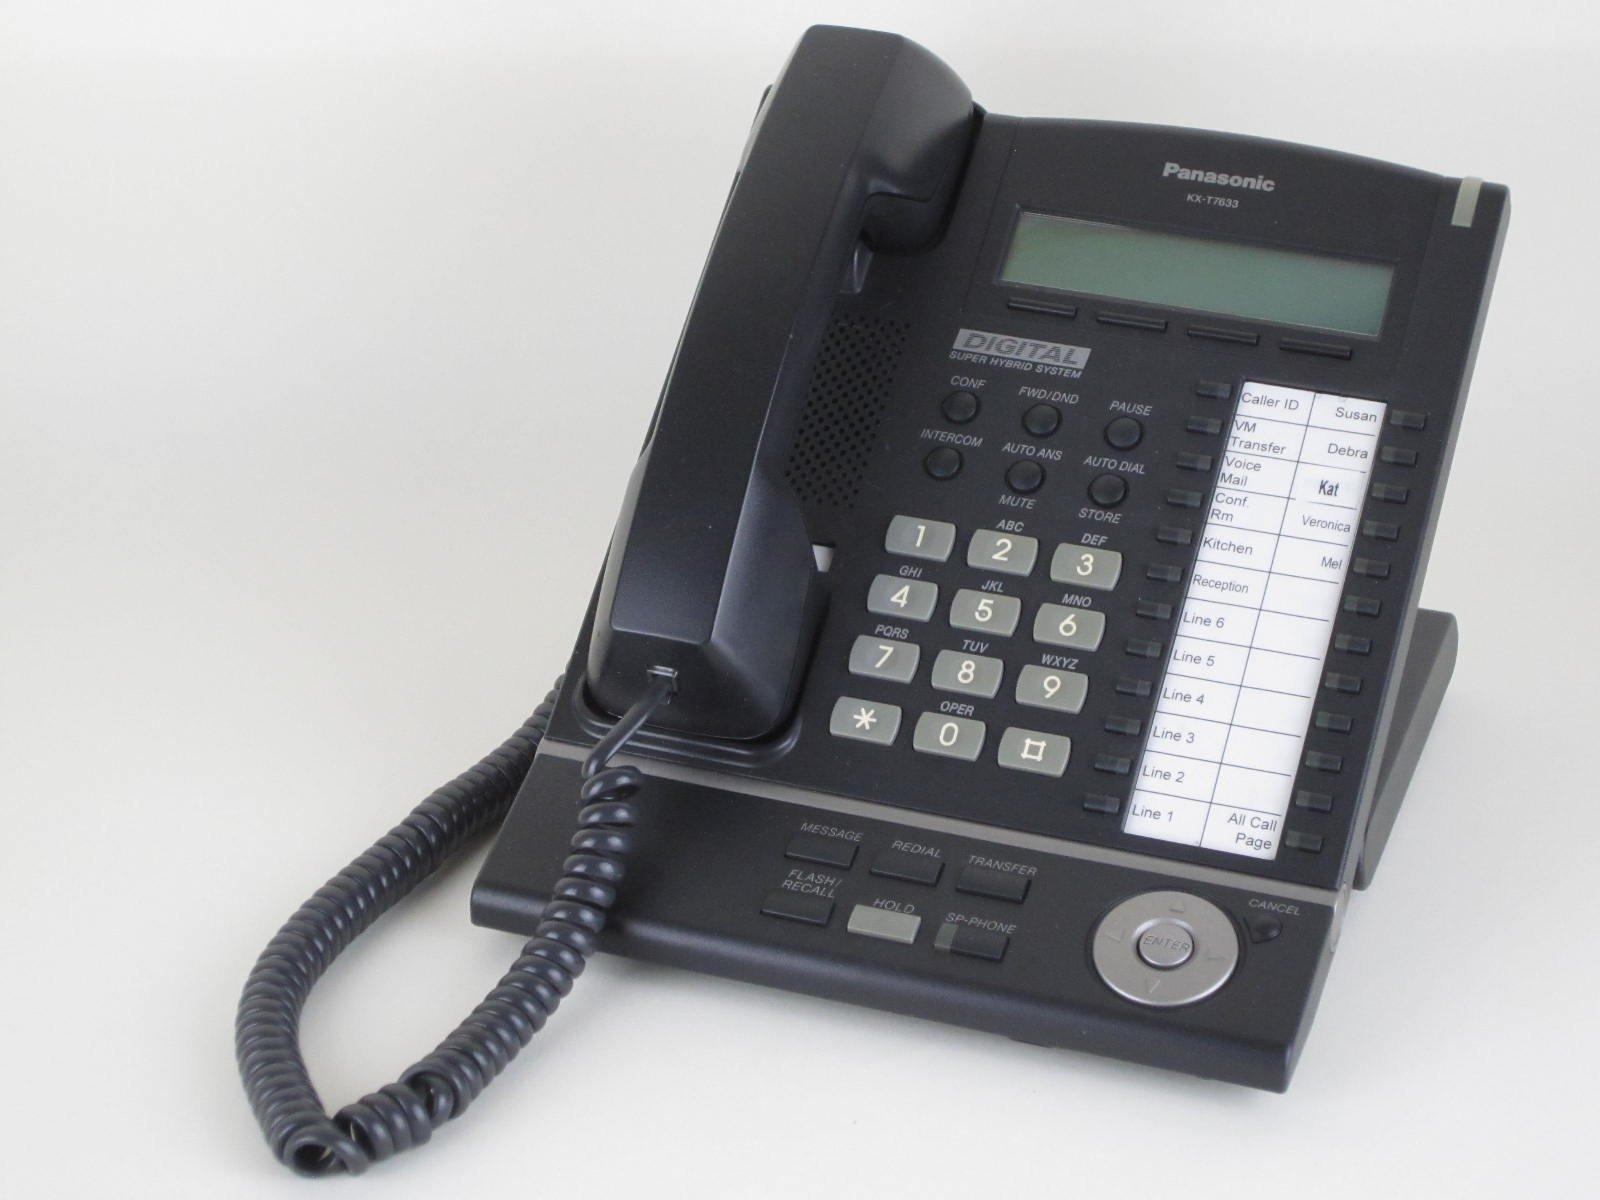 Panasonic KX-T7633-B Digital Telephone Black 3-Line LCD Proprietary Phone (Certified Refurbished)